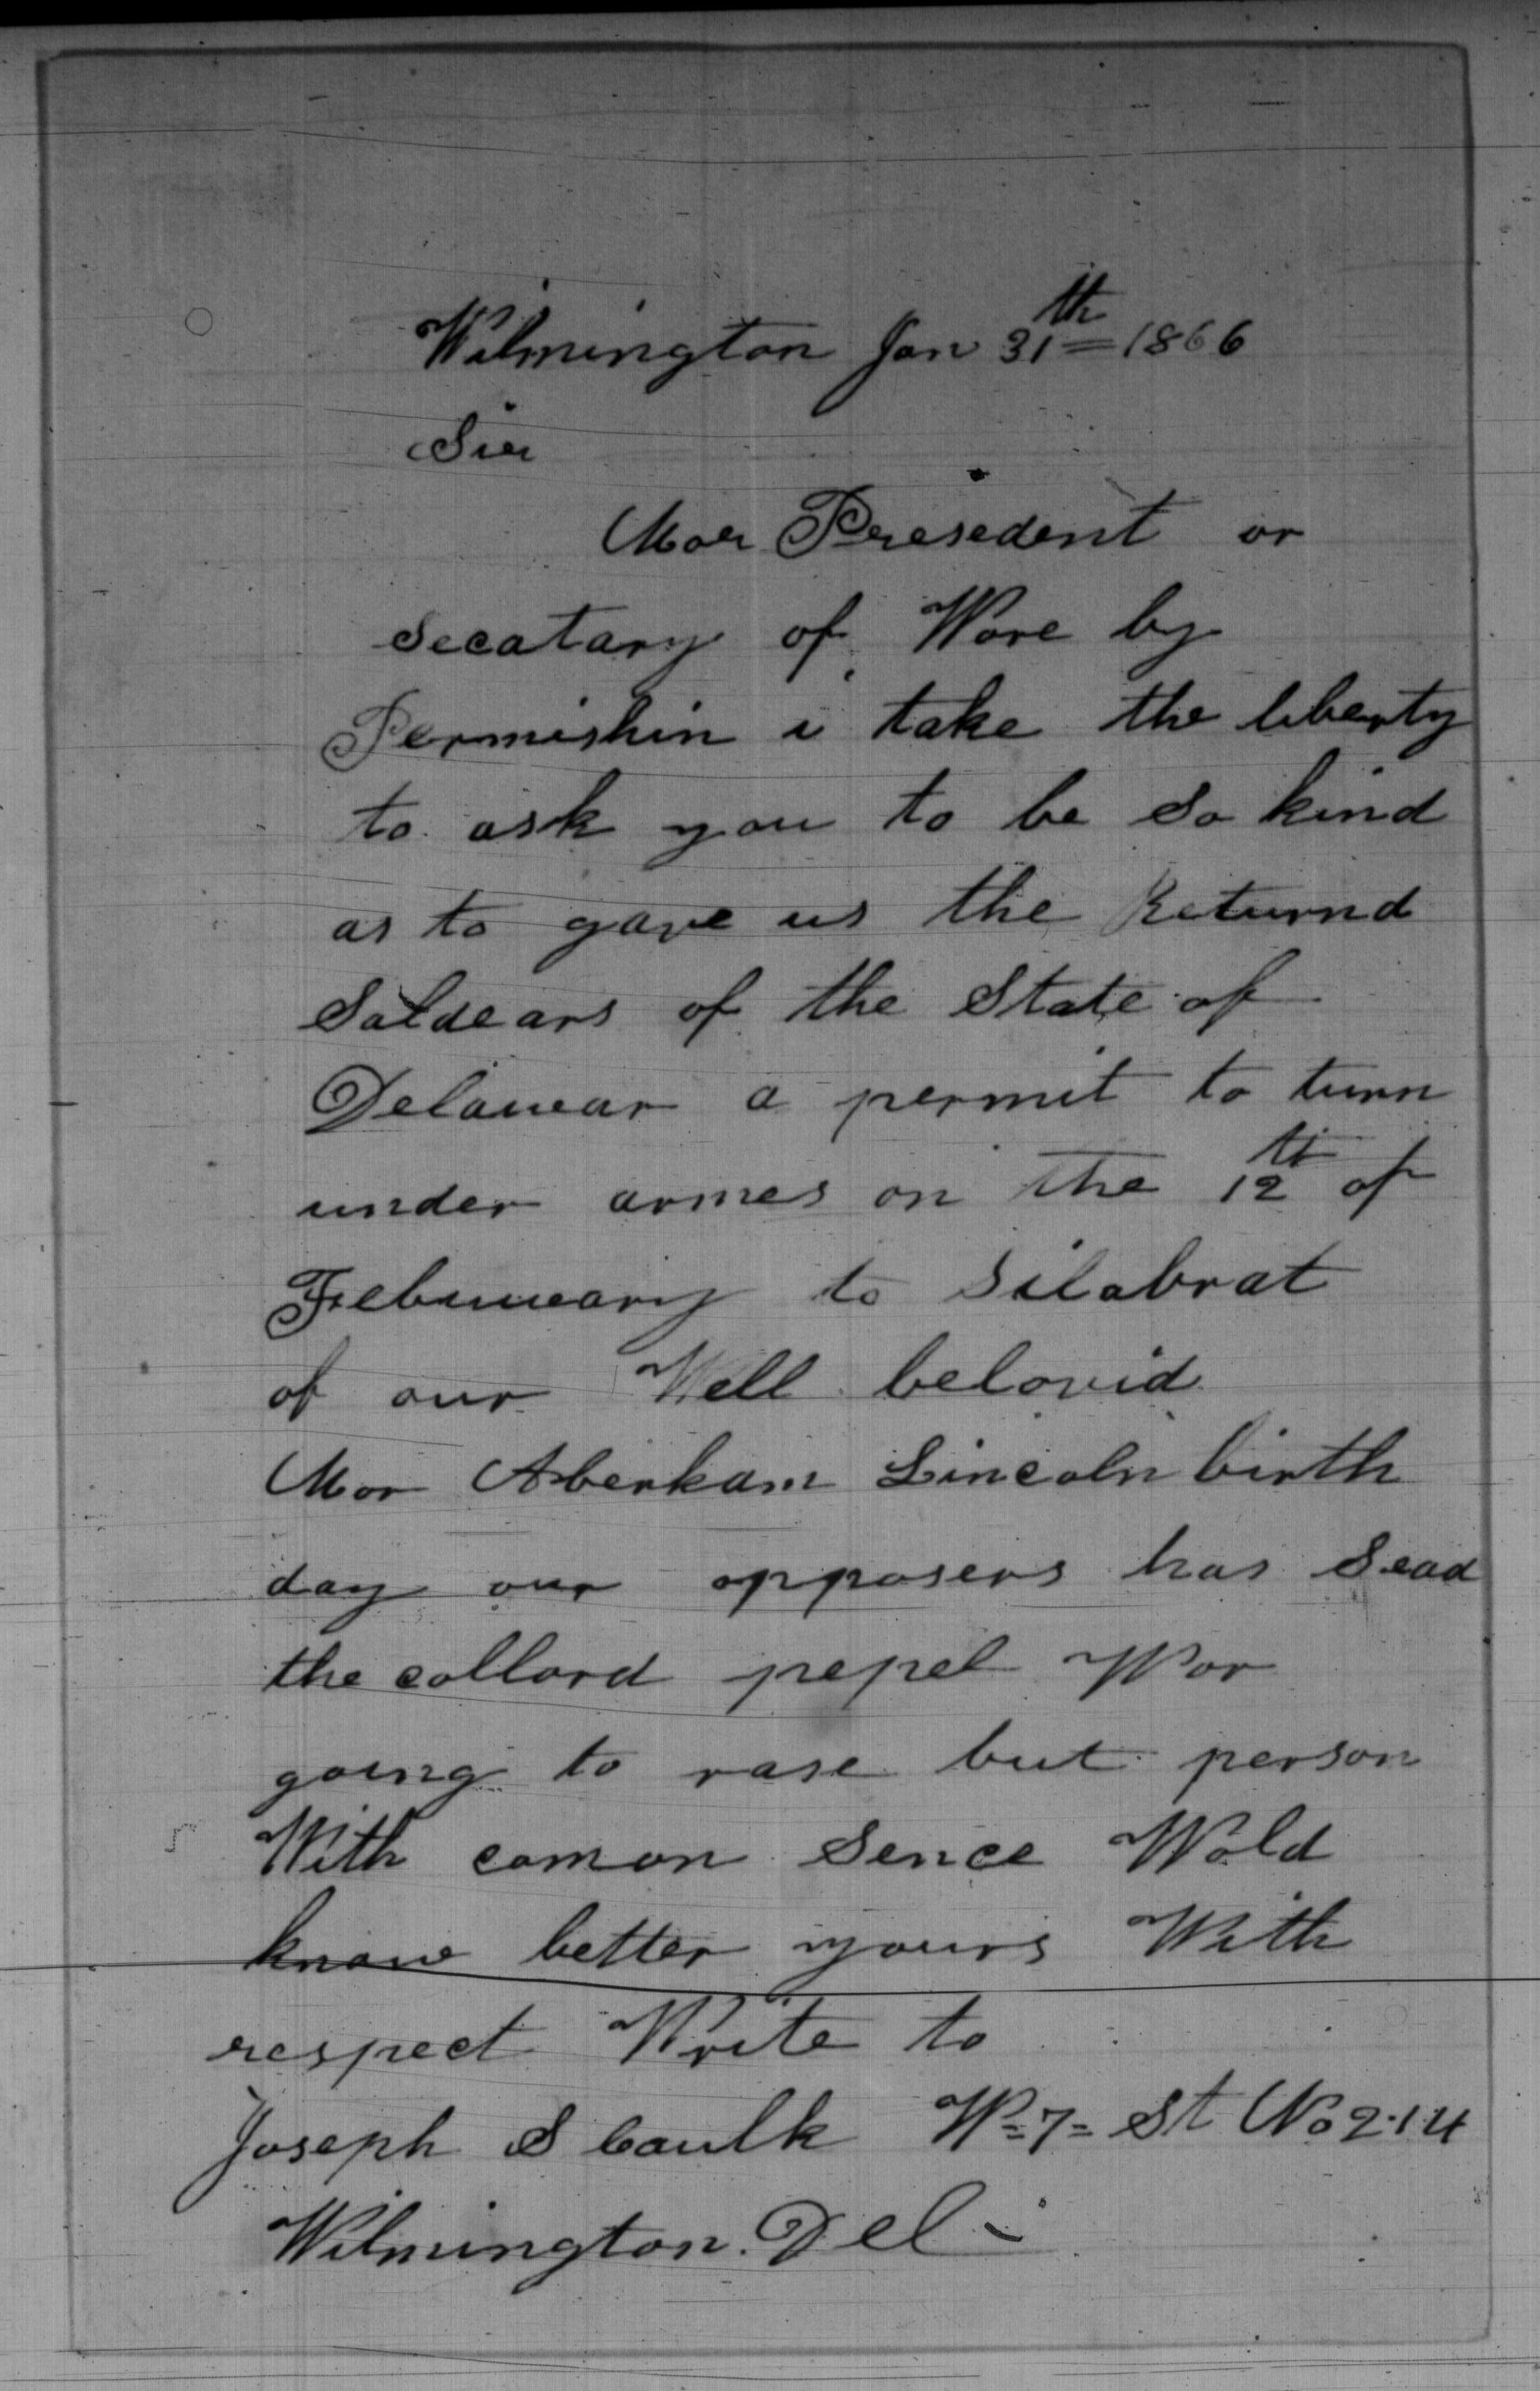 Joseph S. Caulk to Andrew Johnson and Edwin M. Stanton